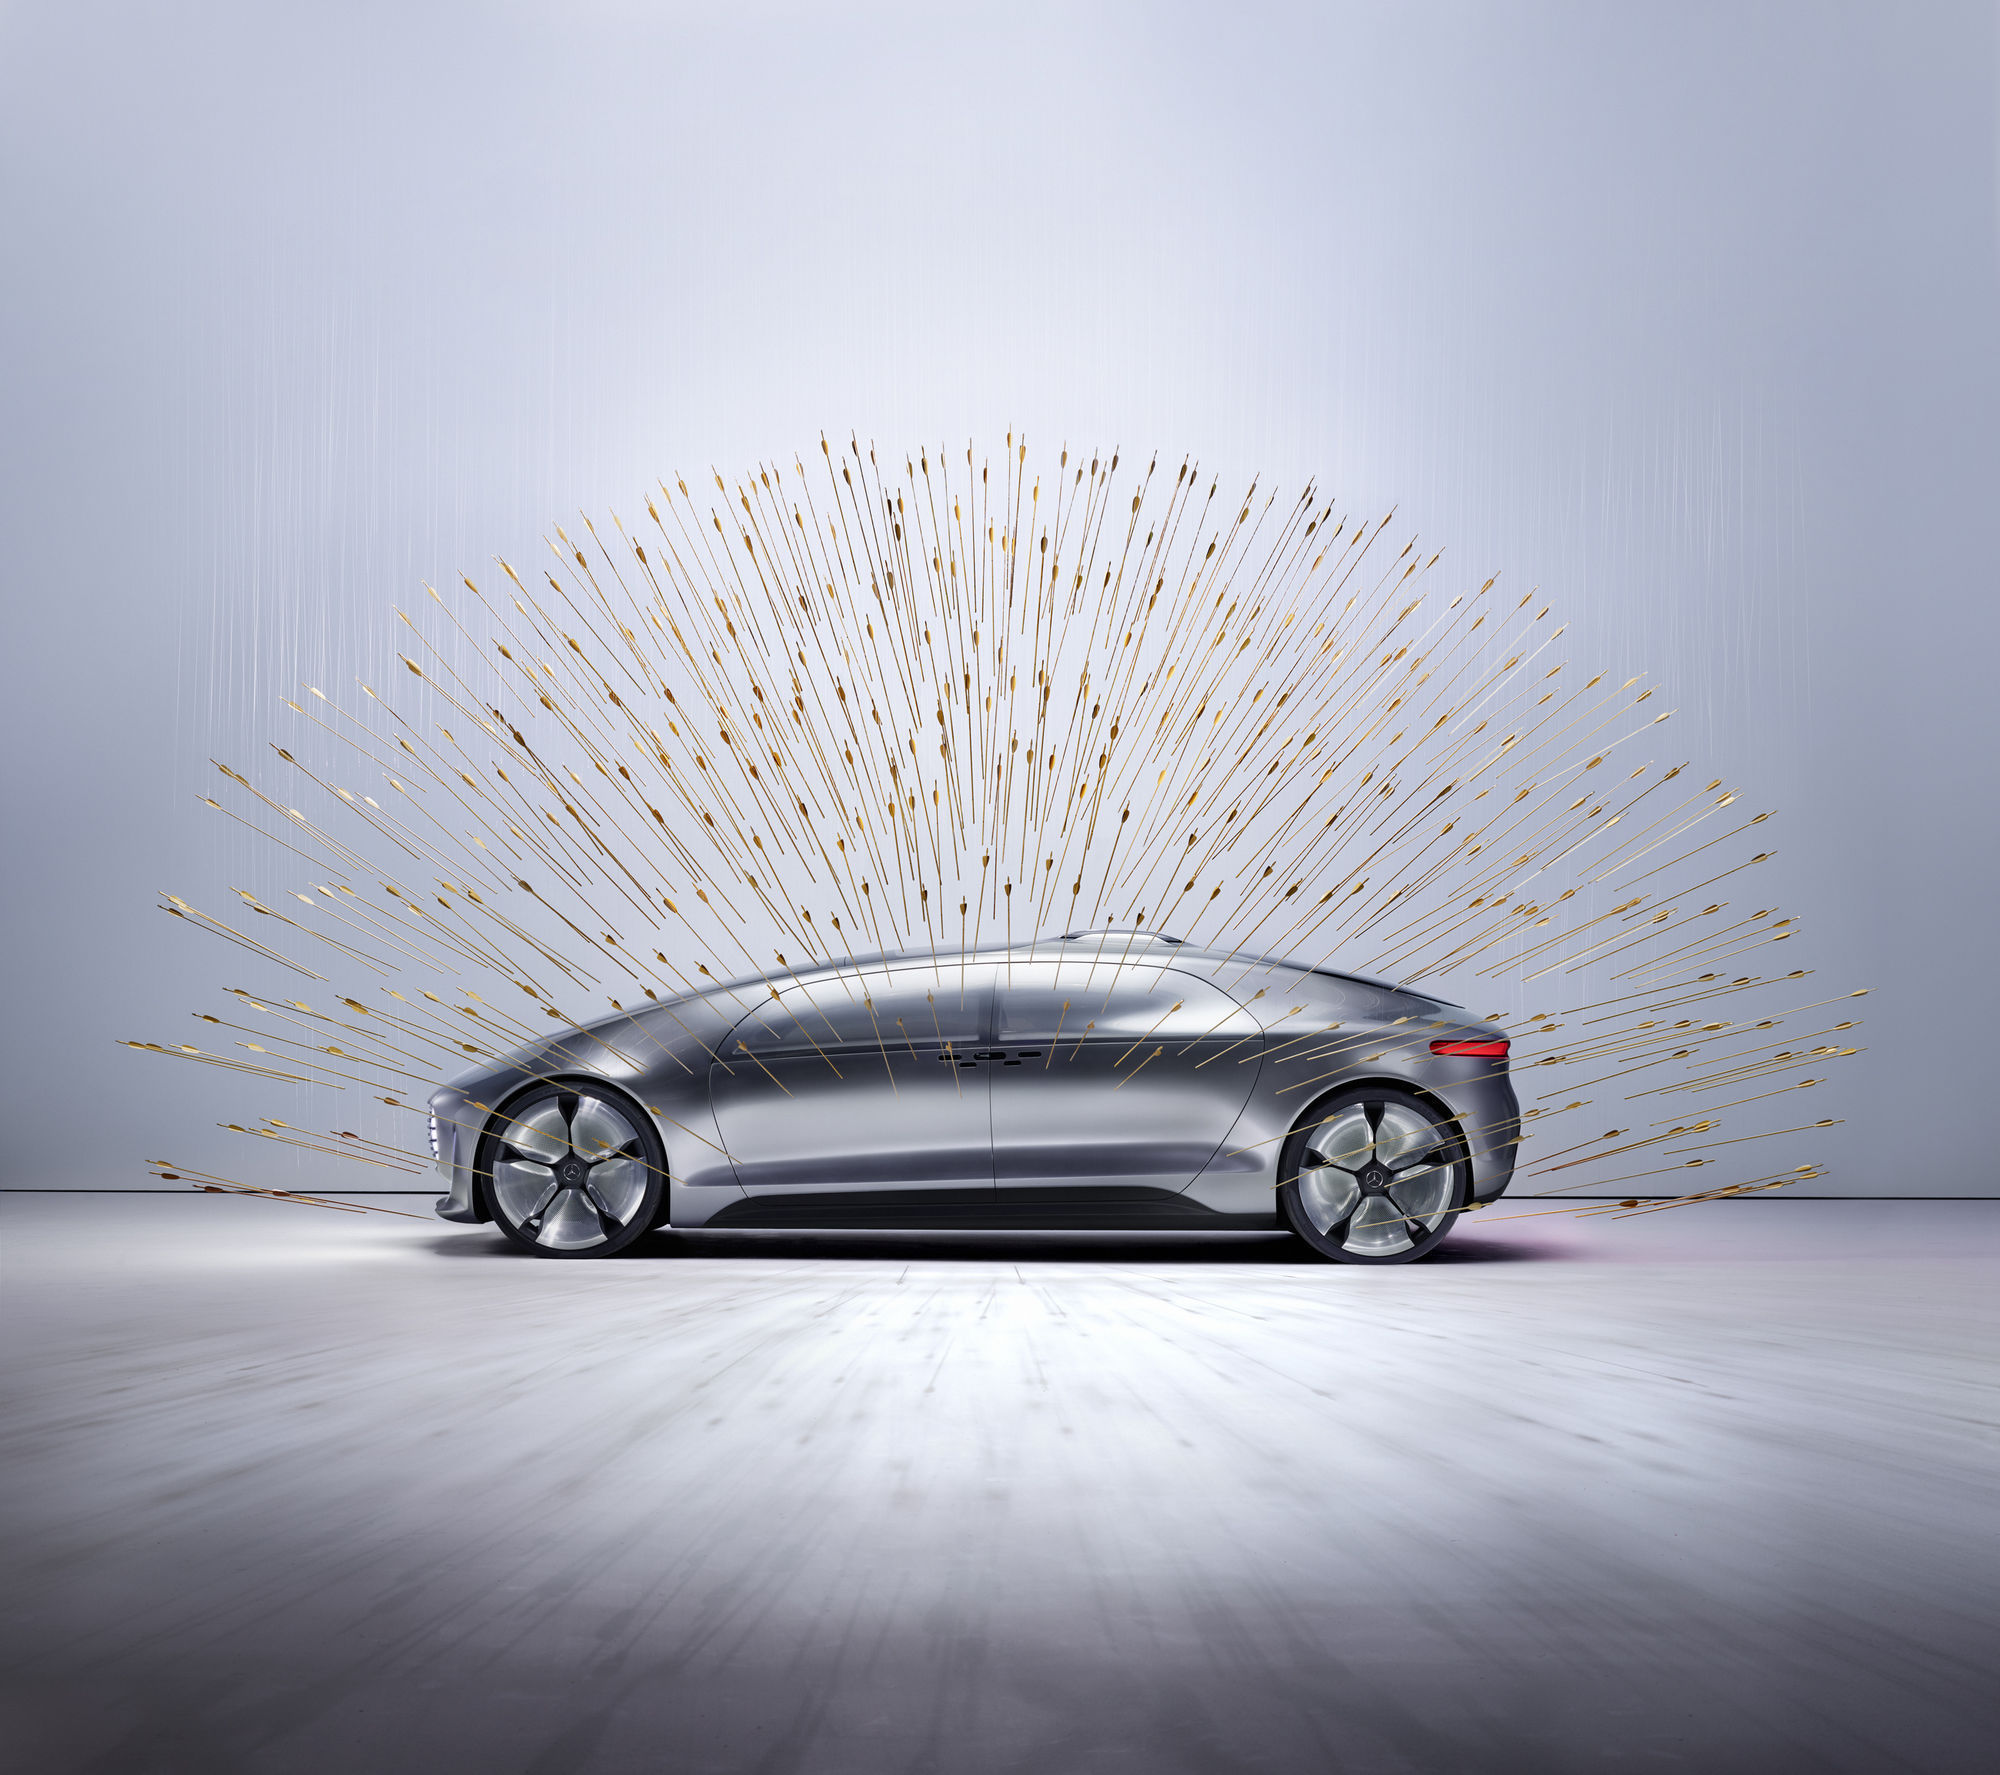 ANTONI for Mercedes Benz